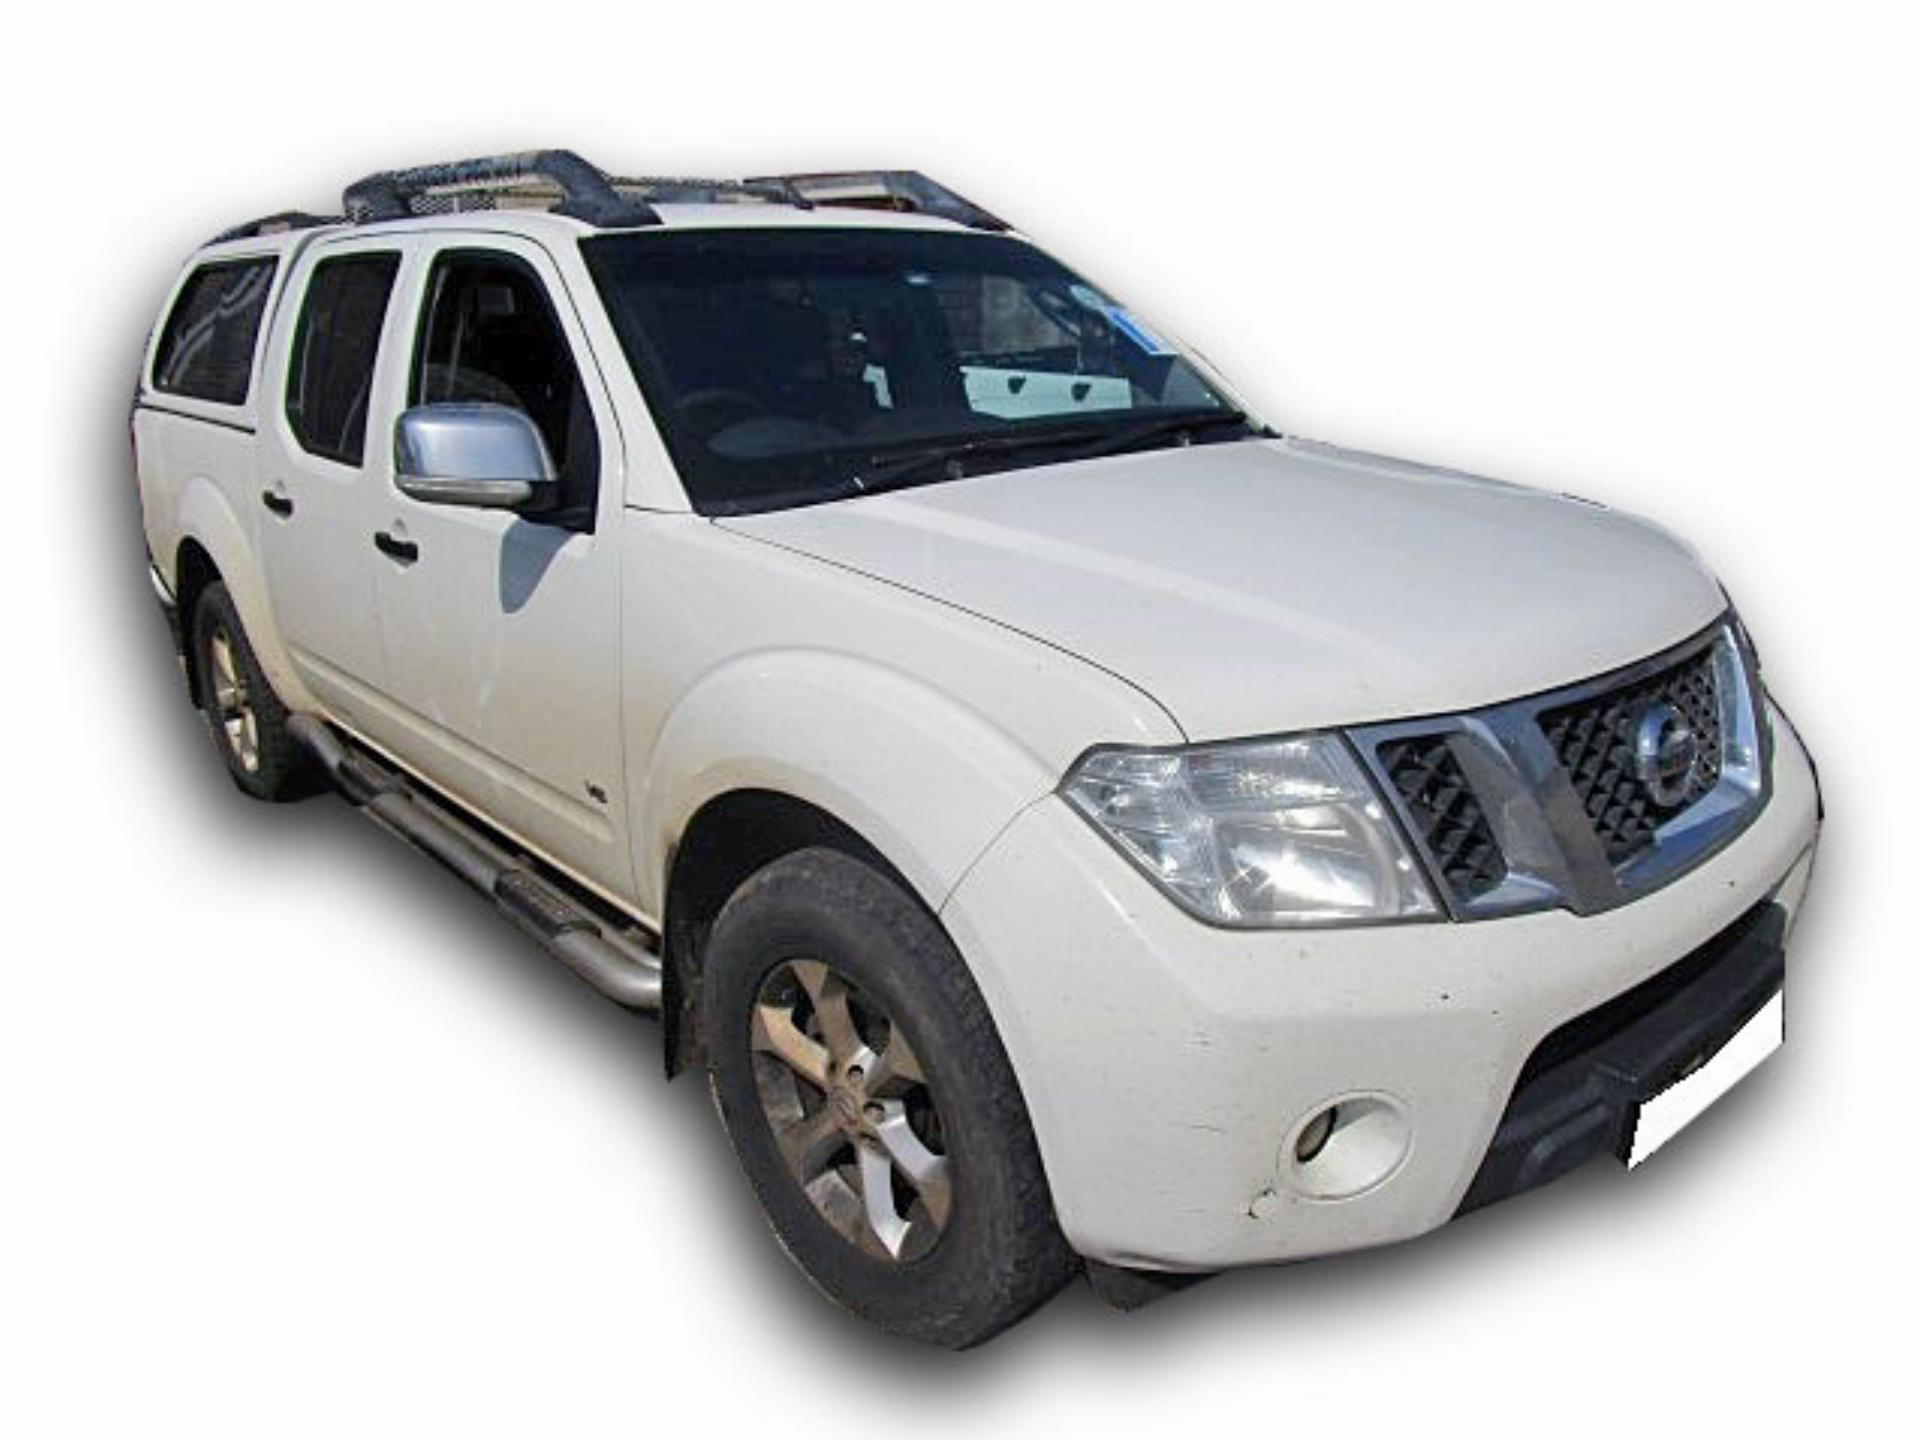 Nissan Navara 3.0 Dci LE A/T